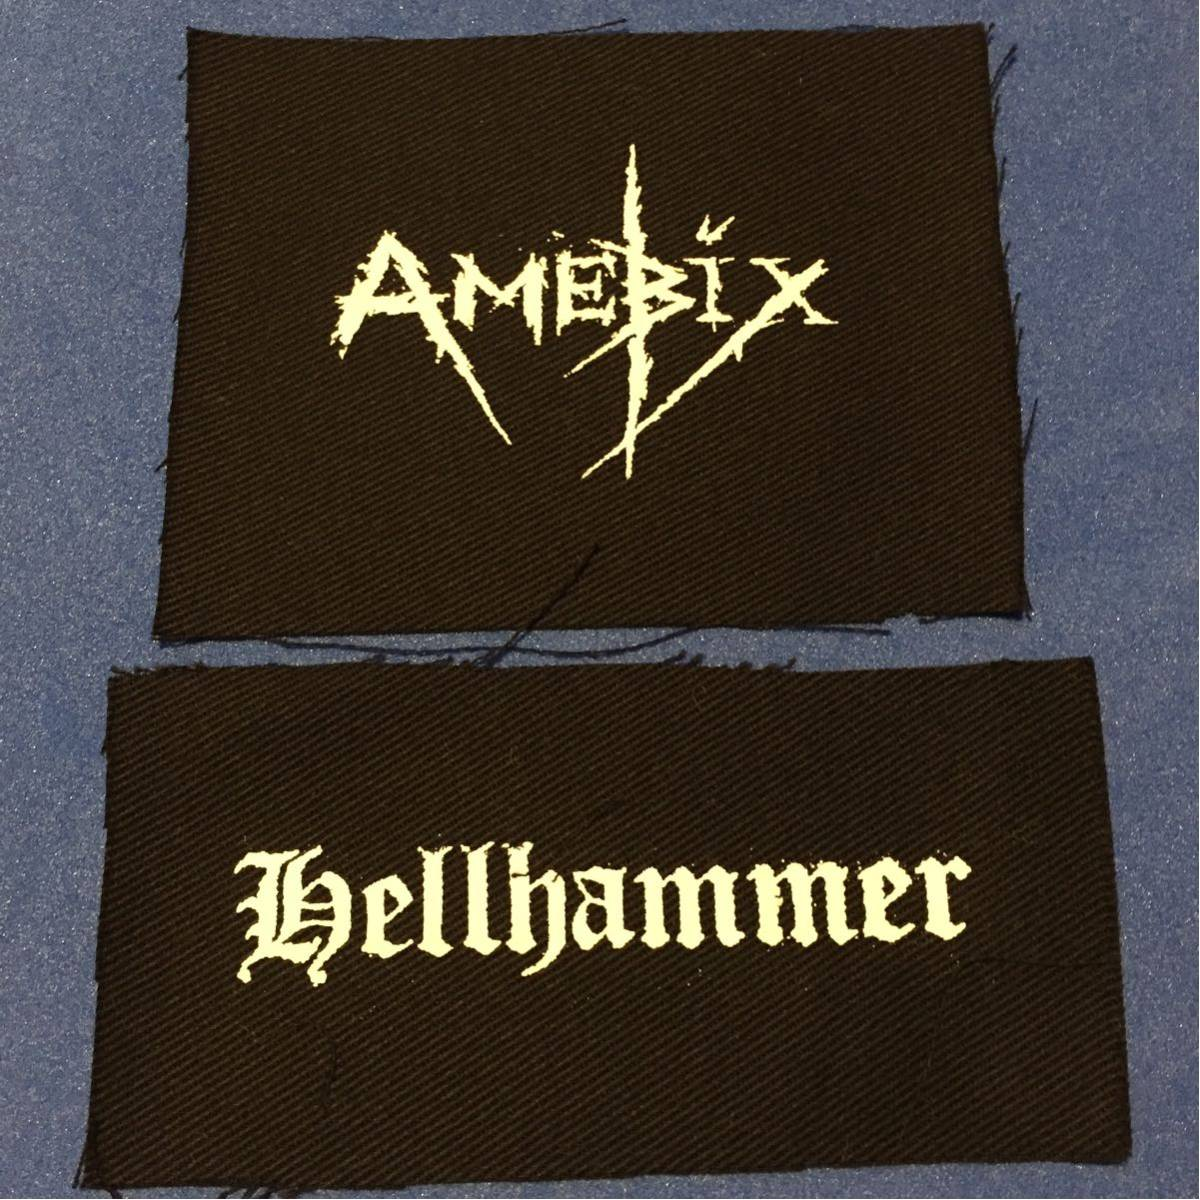 amebix hellhammer パッチセット punk metal パンク メタル